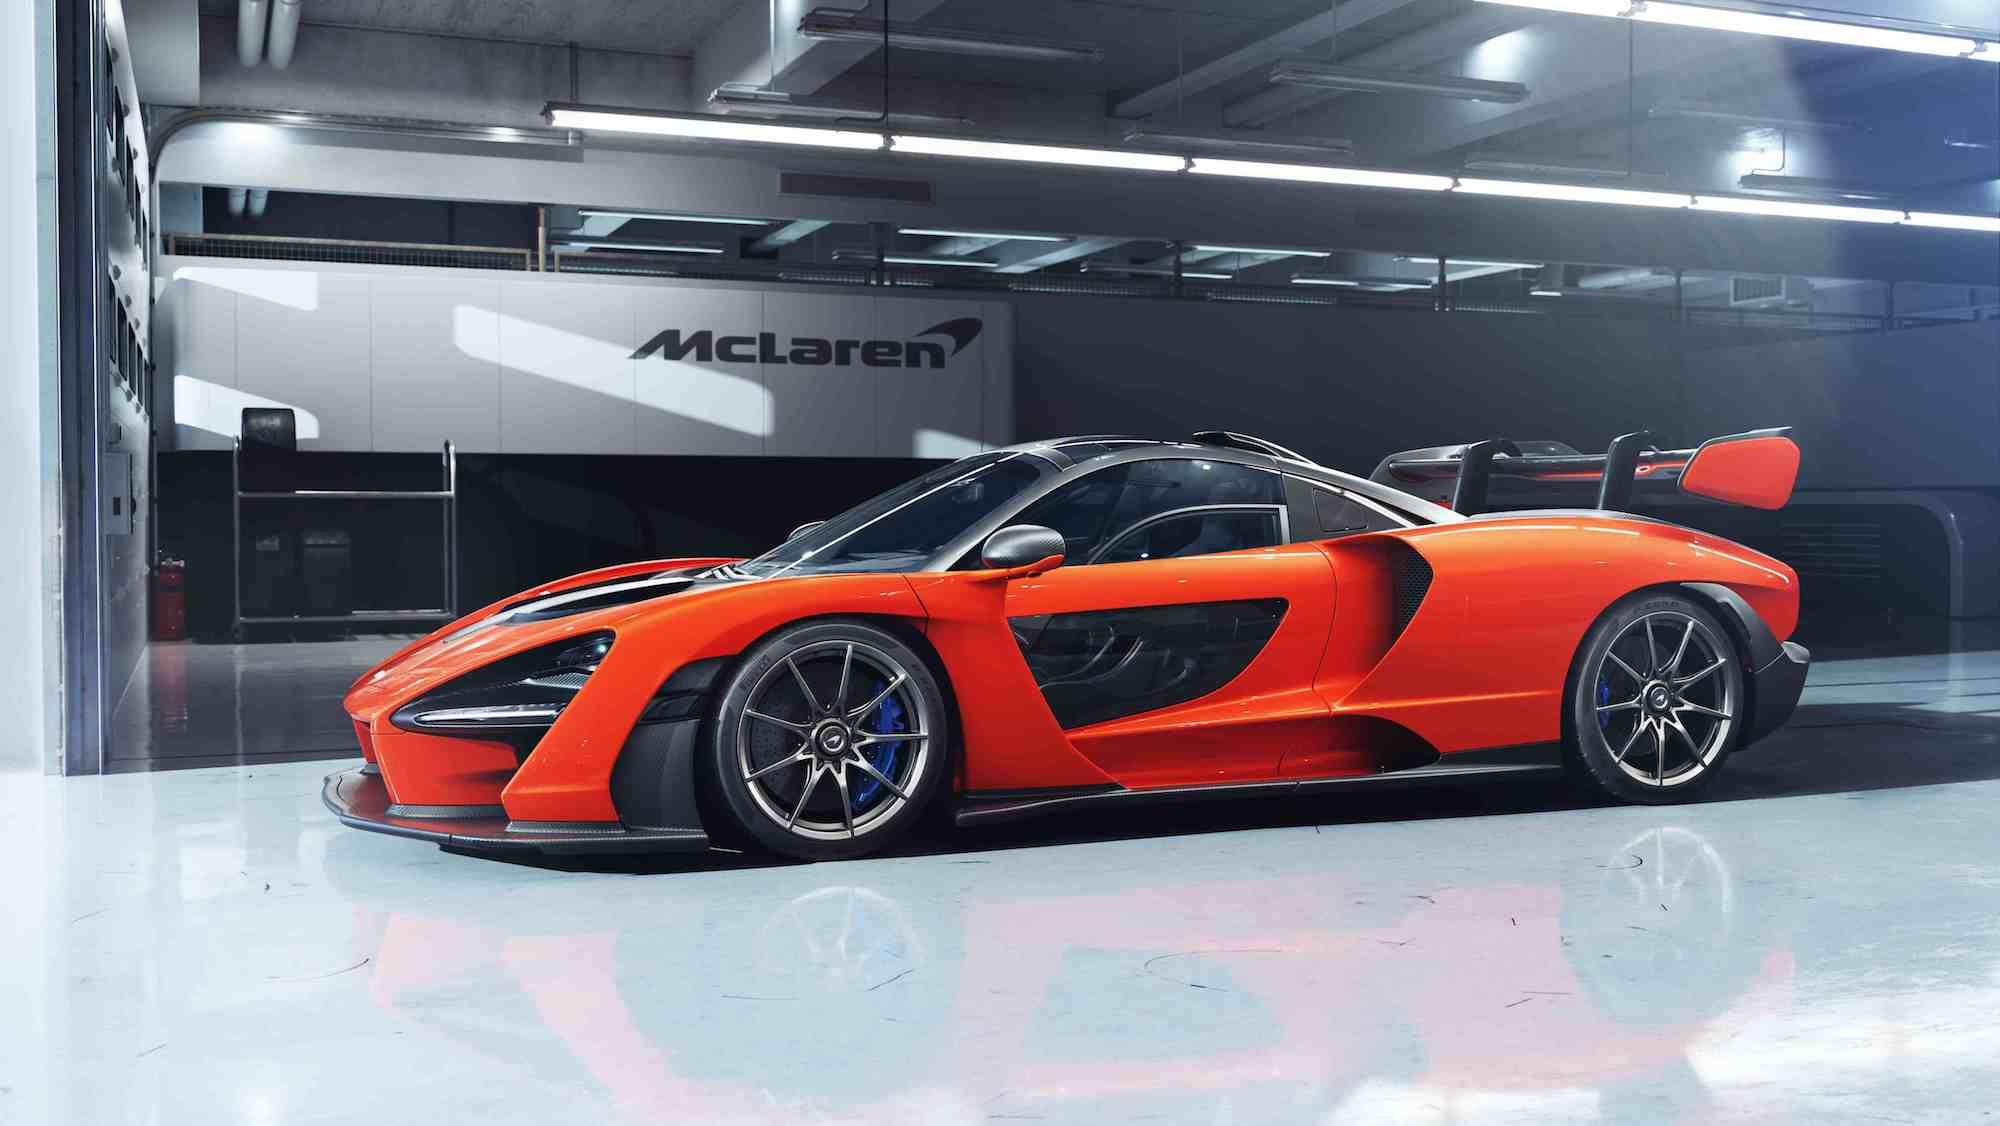 McLaren reveals 'ultimate' Senna supercar with 789bhp